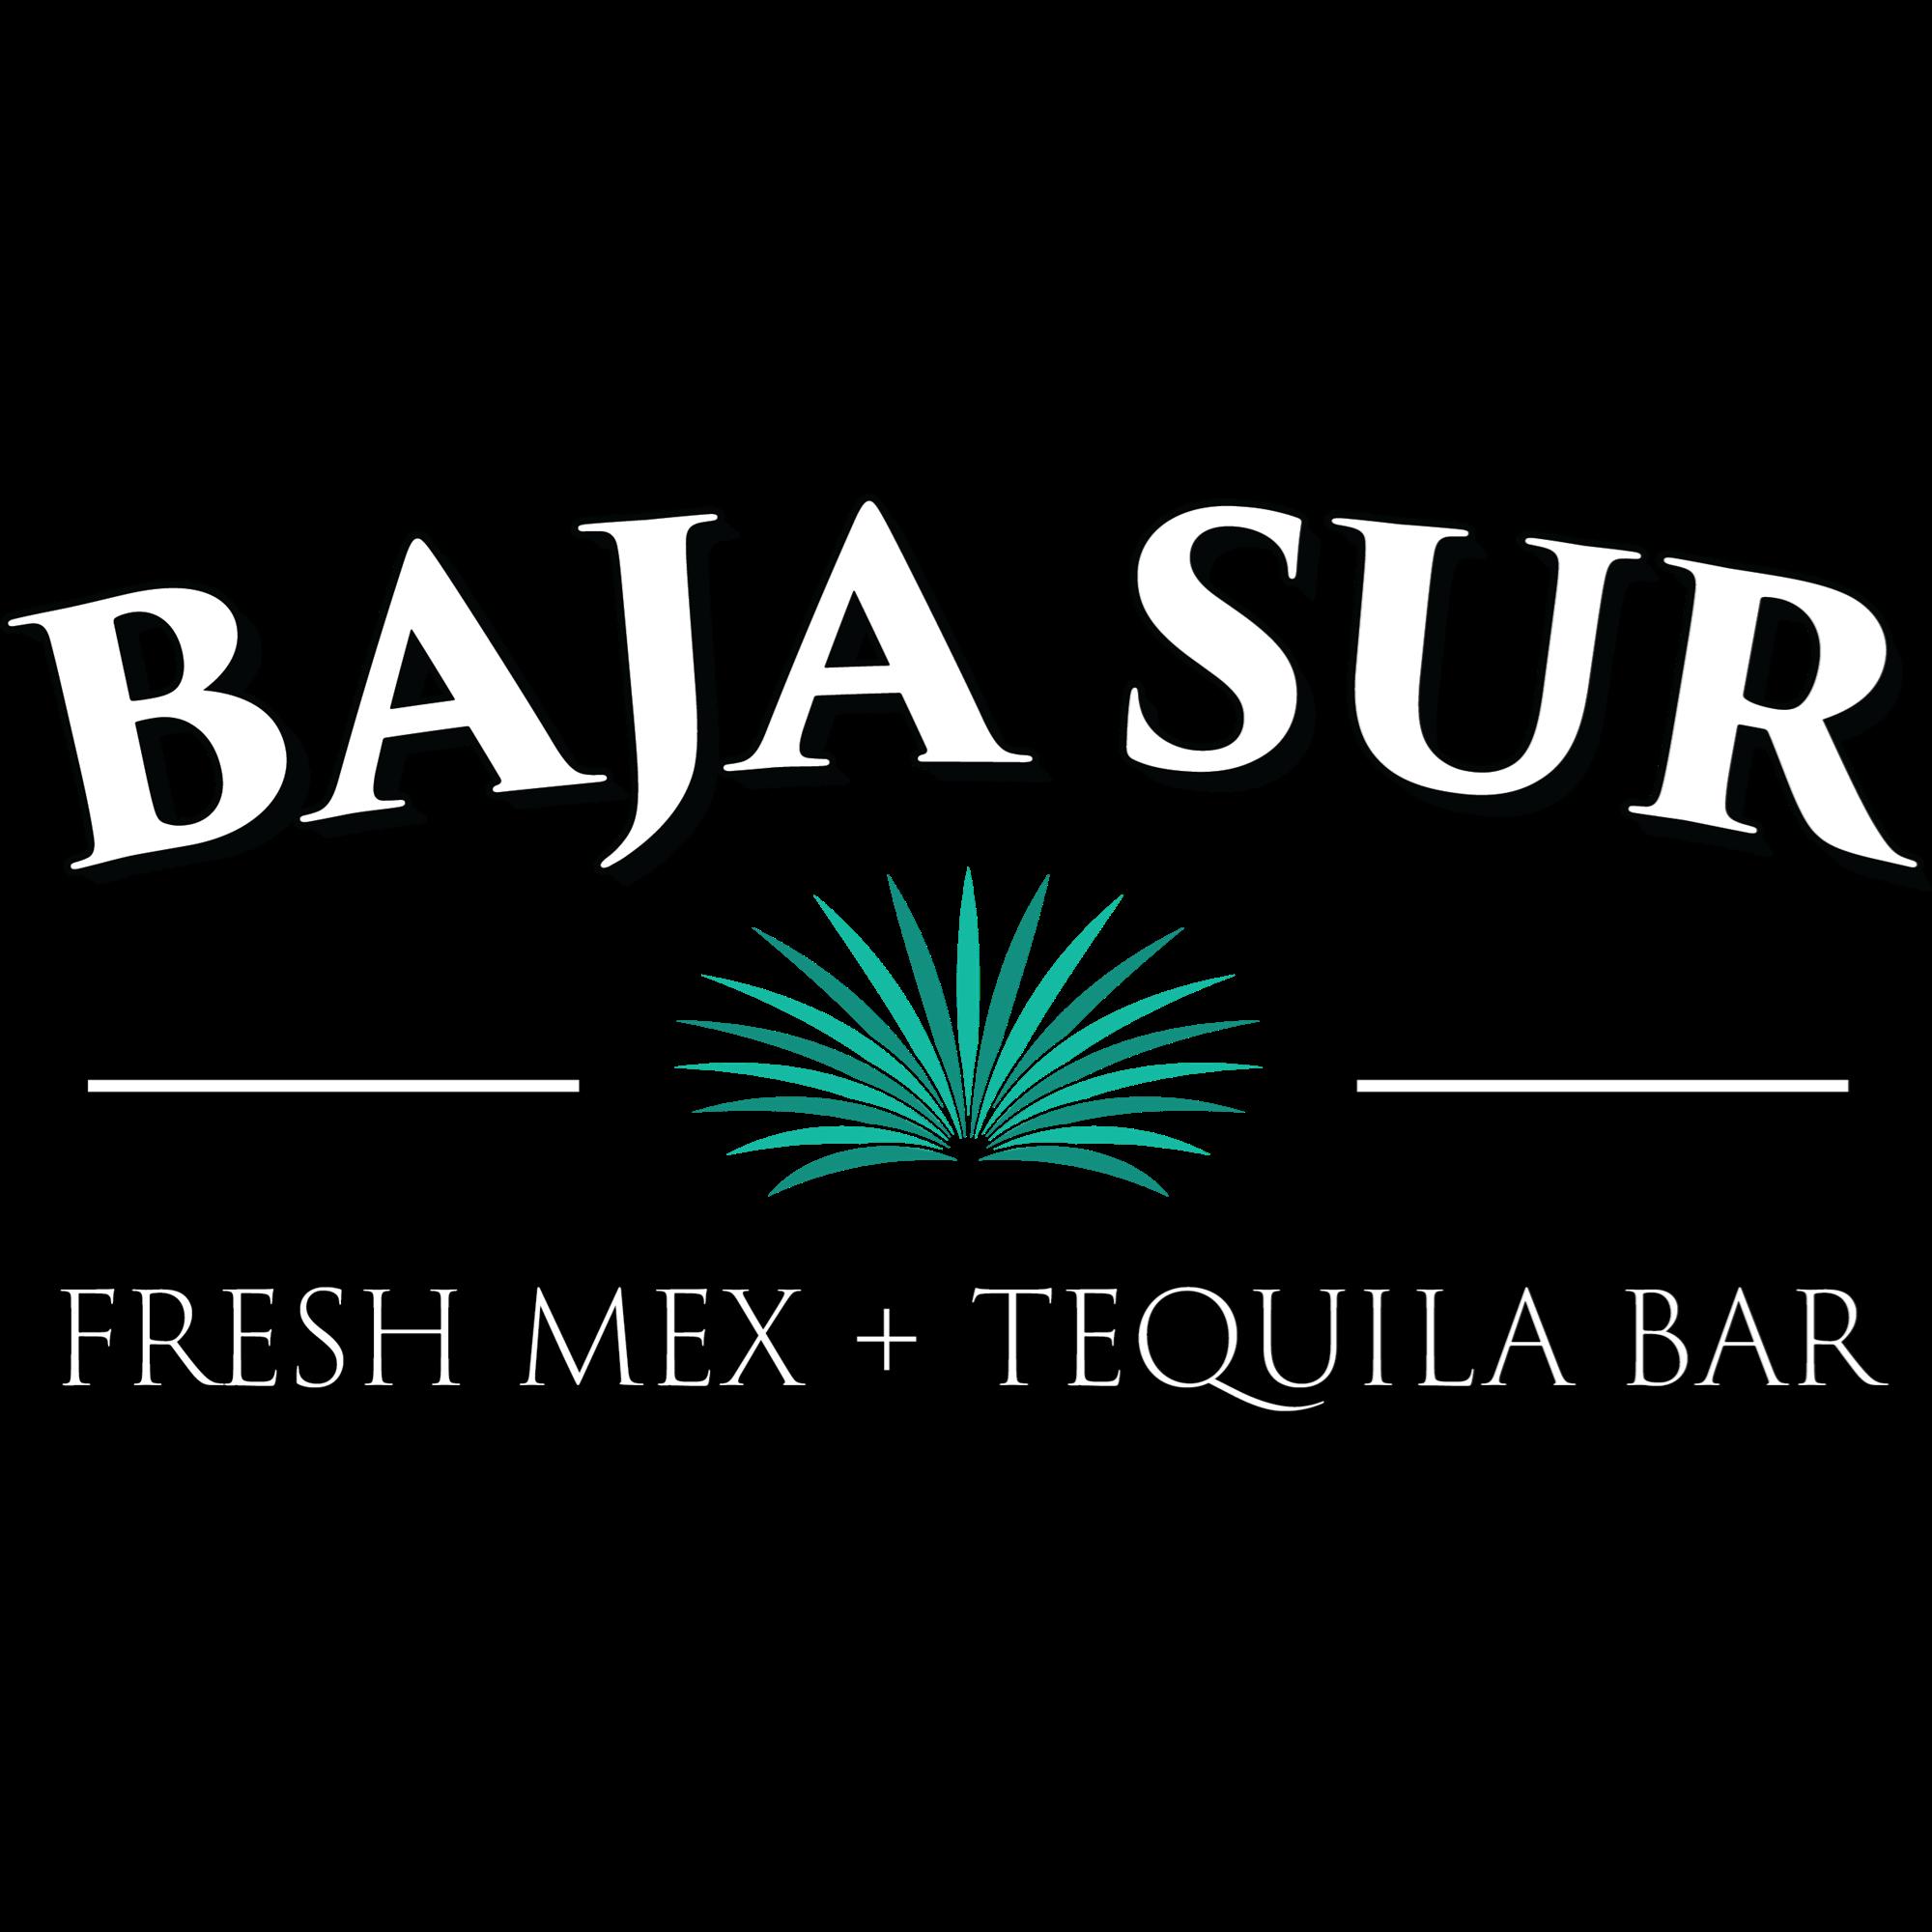 Baja Sur Fresh Mex + Tequila Bar